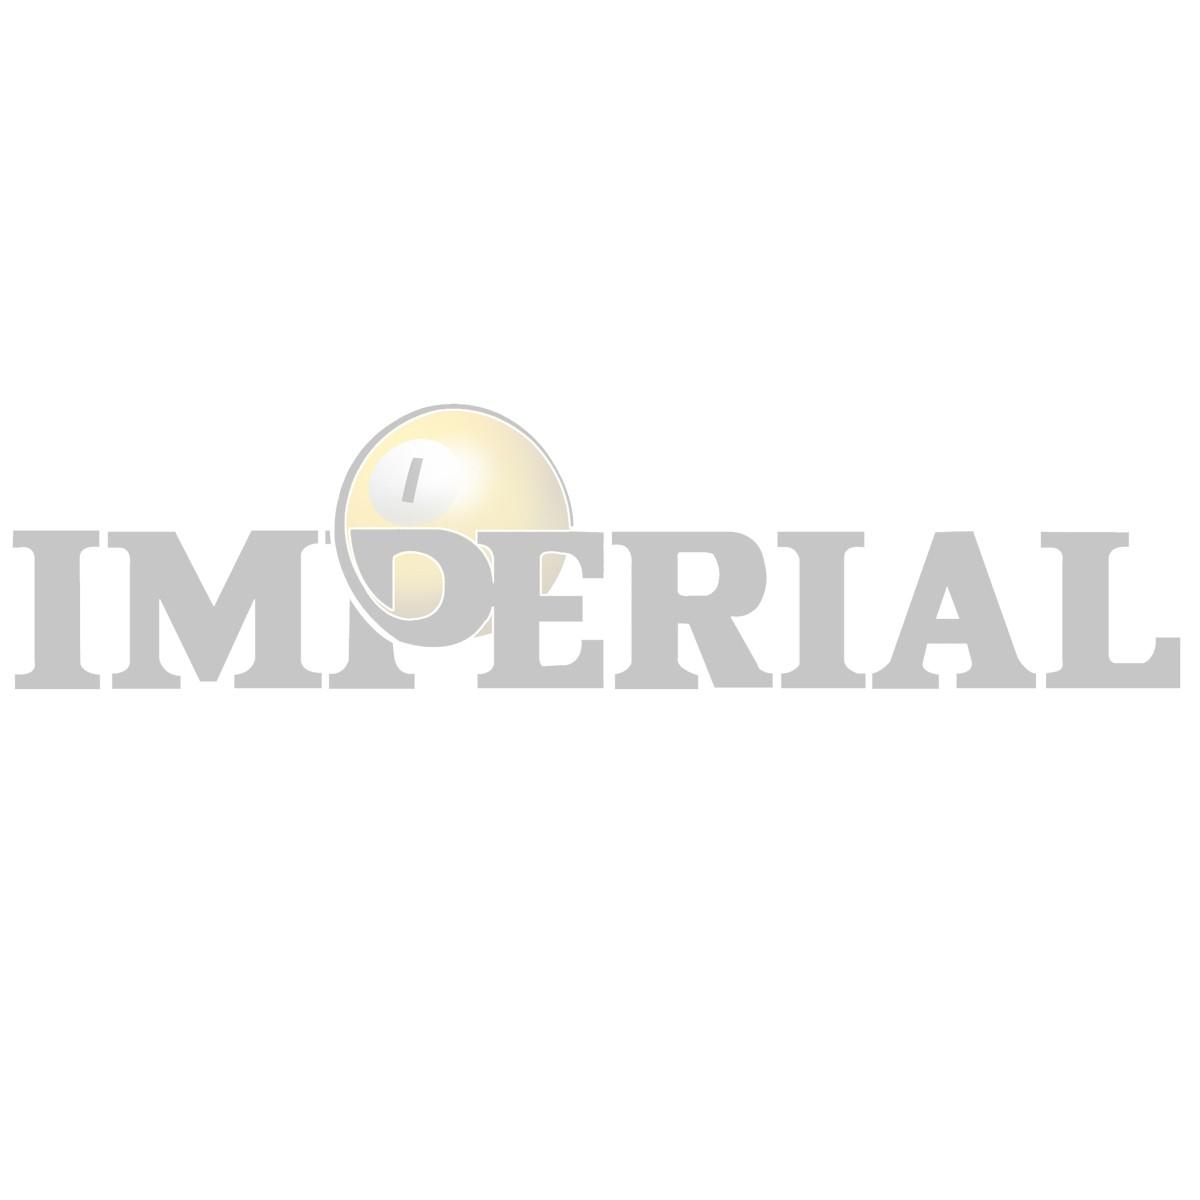 Montreal Canadiens® 8-foot Billiard Cloth